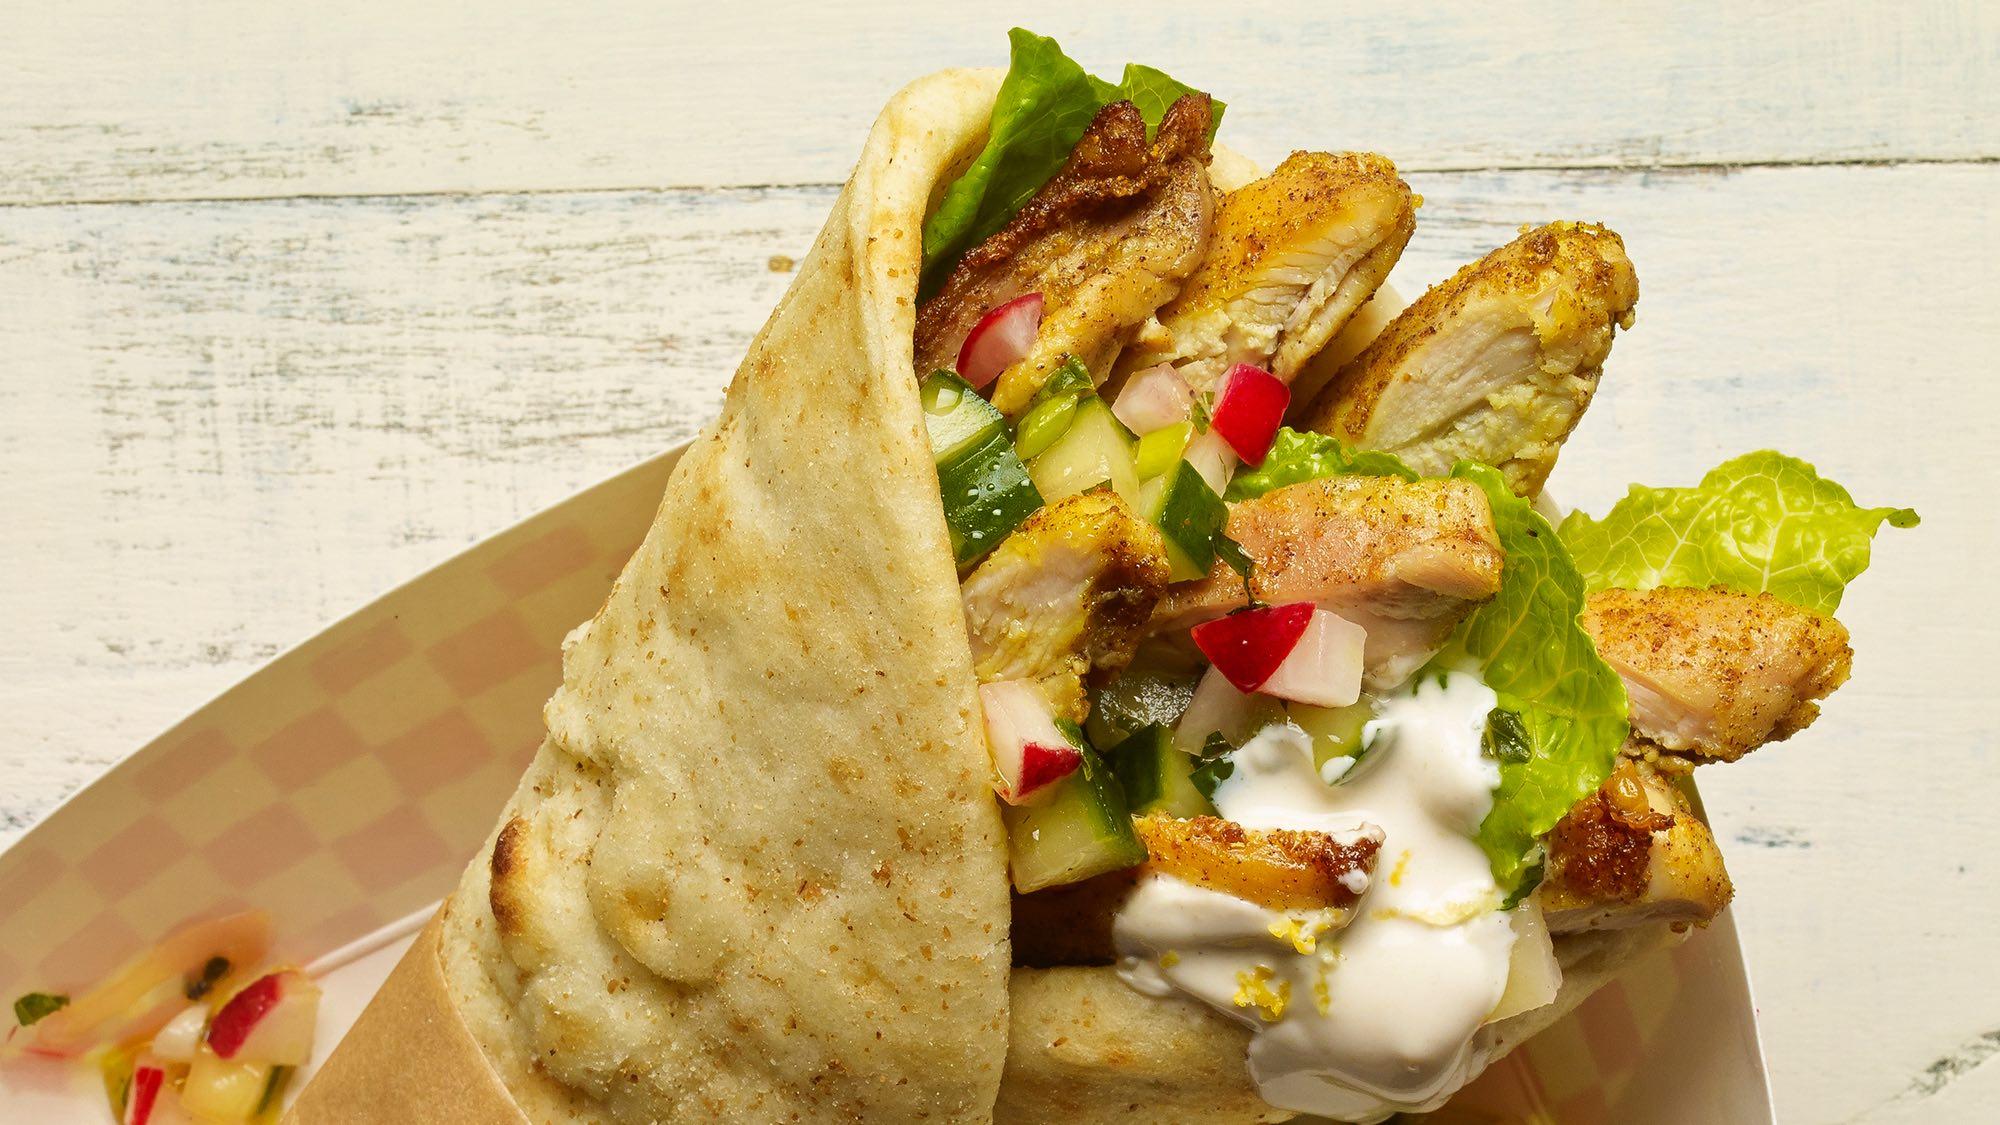 chicken-shawarma-wrap-with-cucumber-radish-relish.jpg